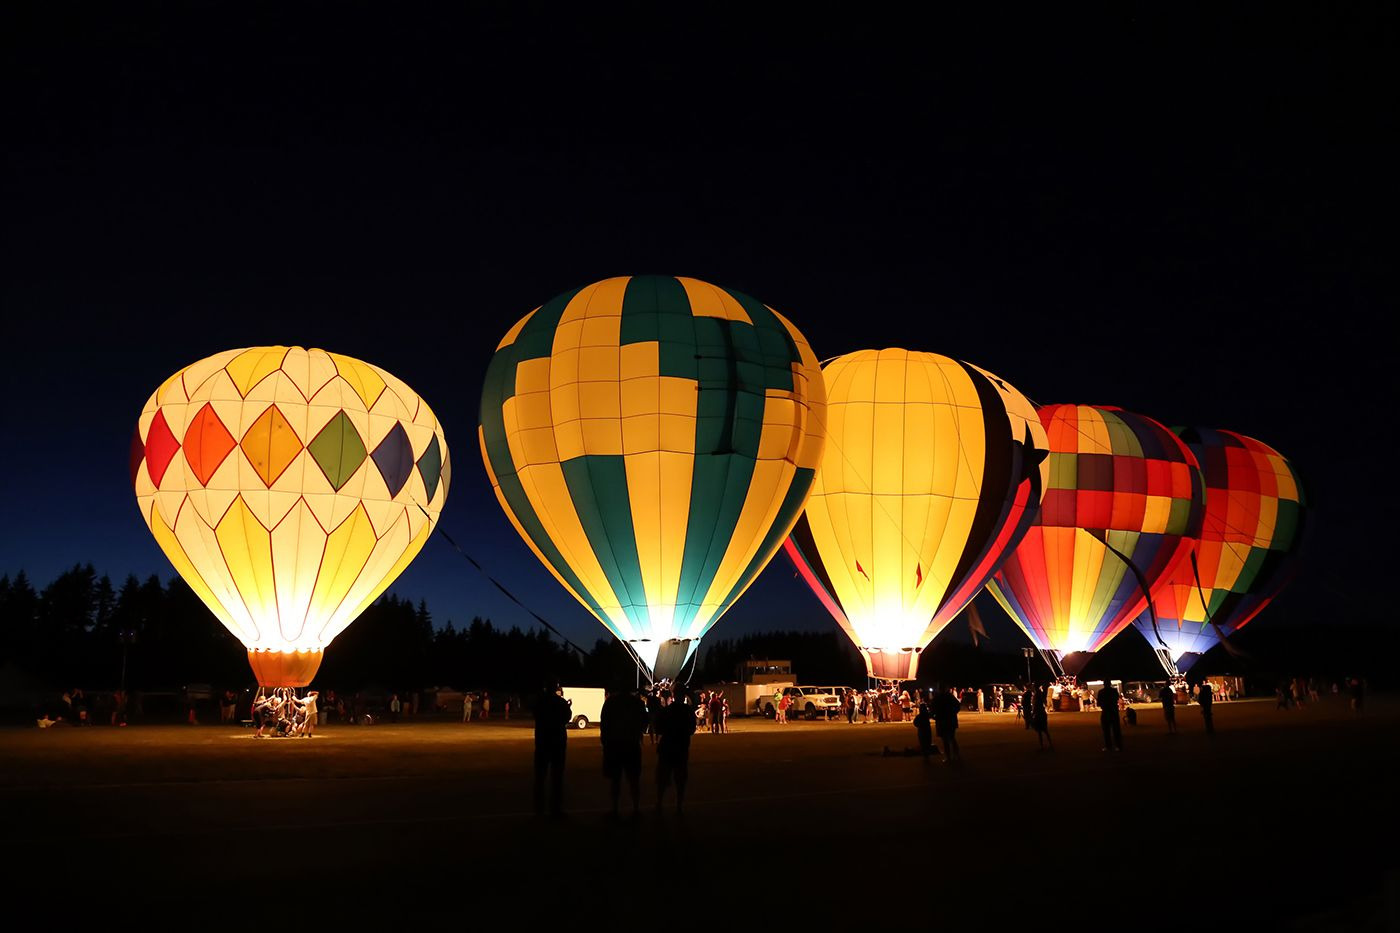 Spirit of Boise Balloon Classic 2020 in Boise, ID Hot